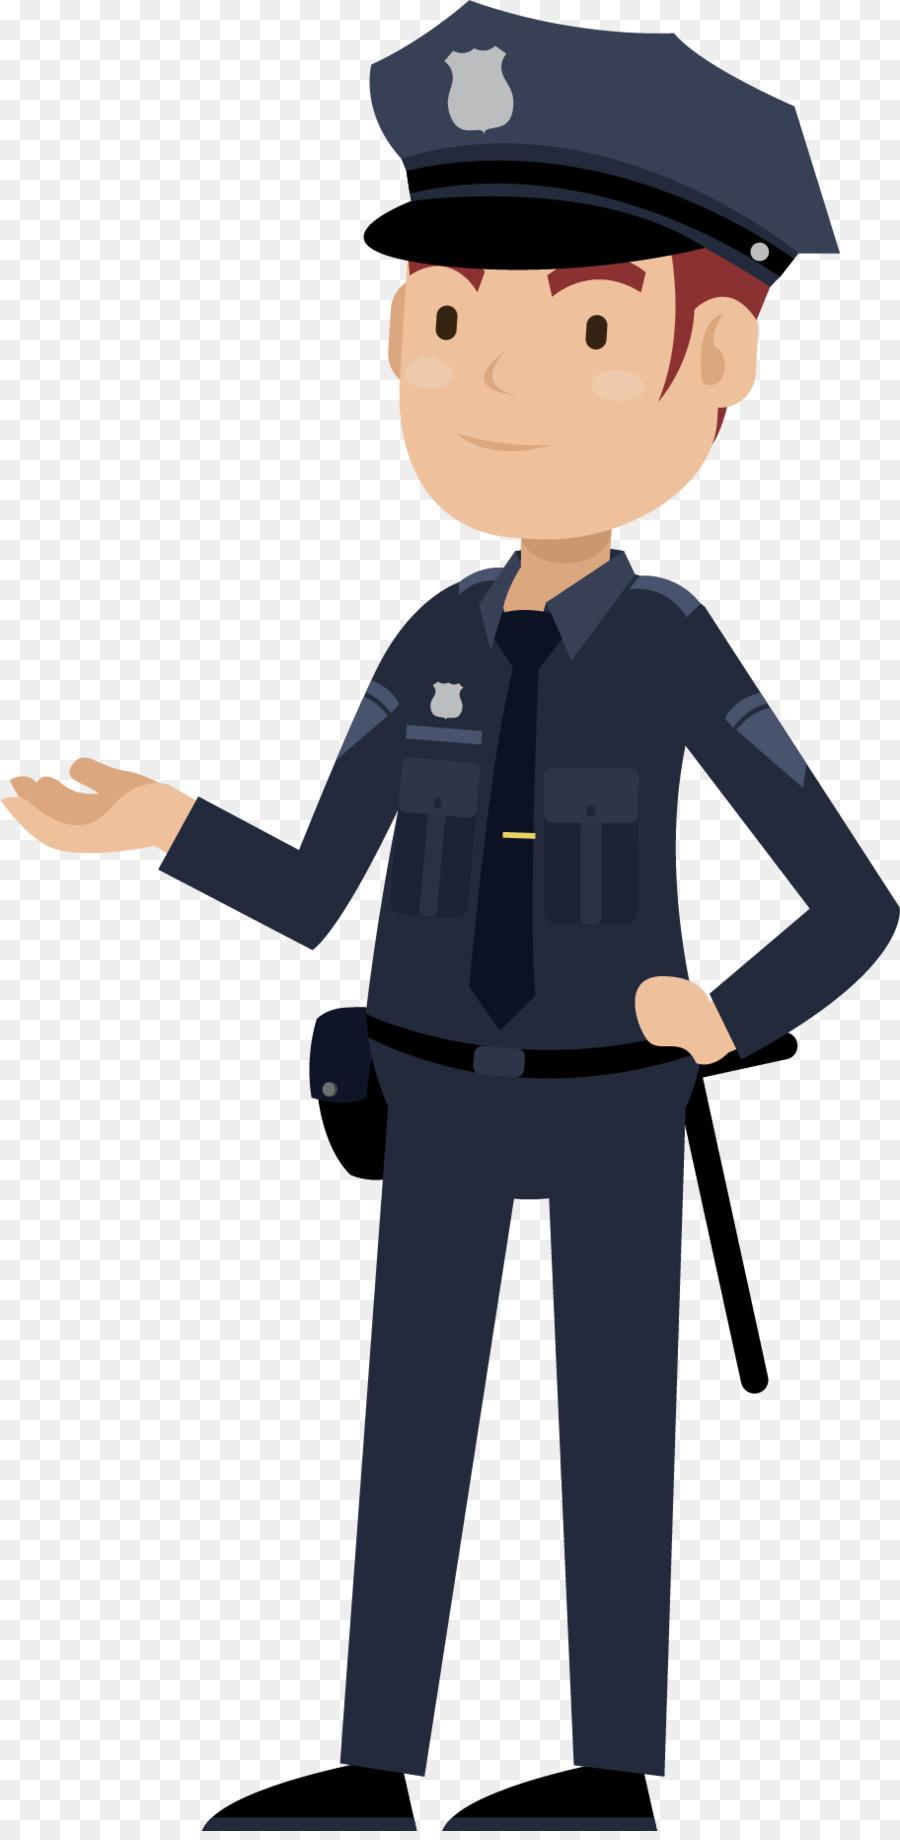 Cartoon Police officer Public security Crime - Cartoon ...